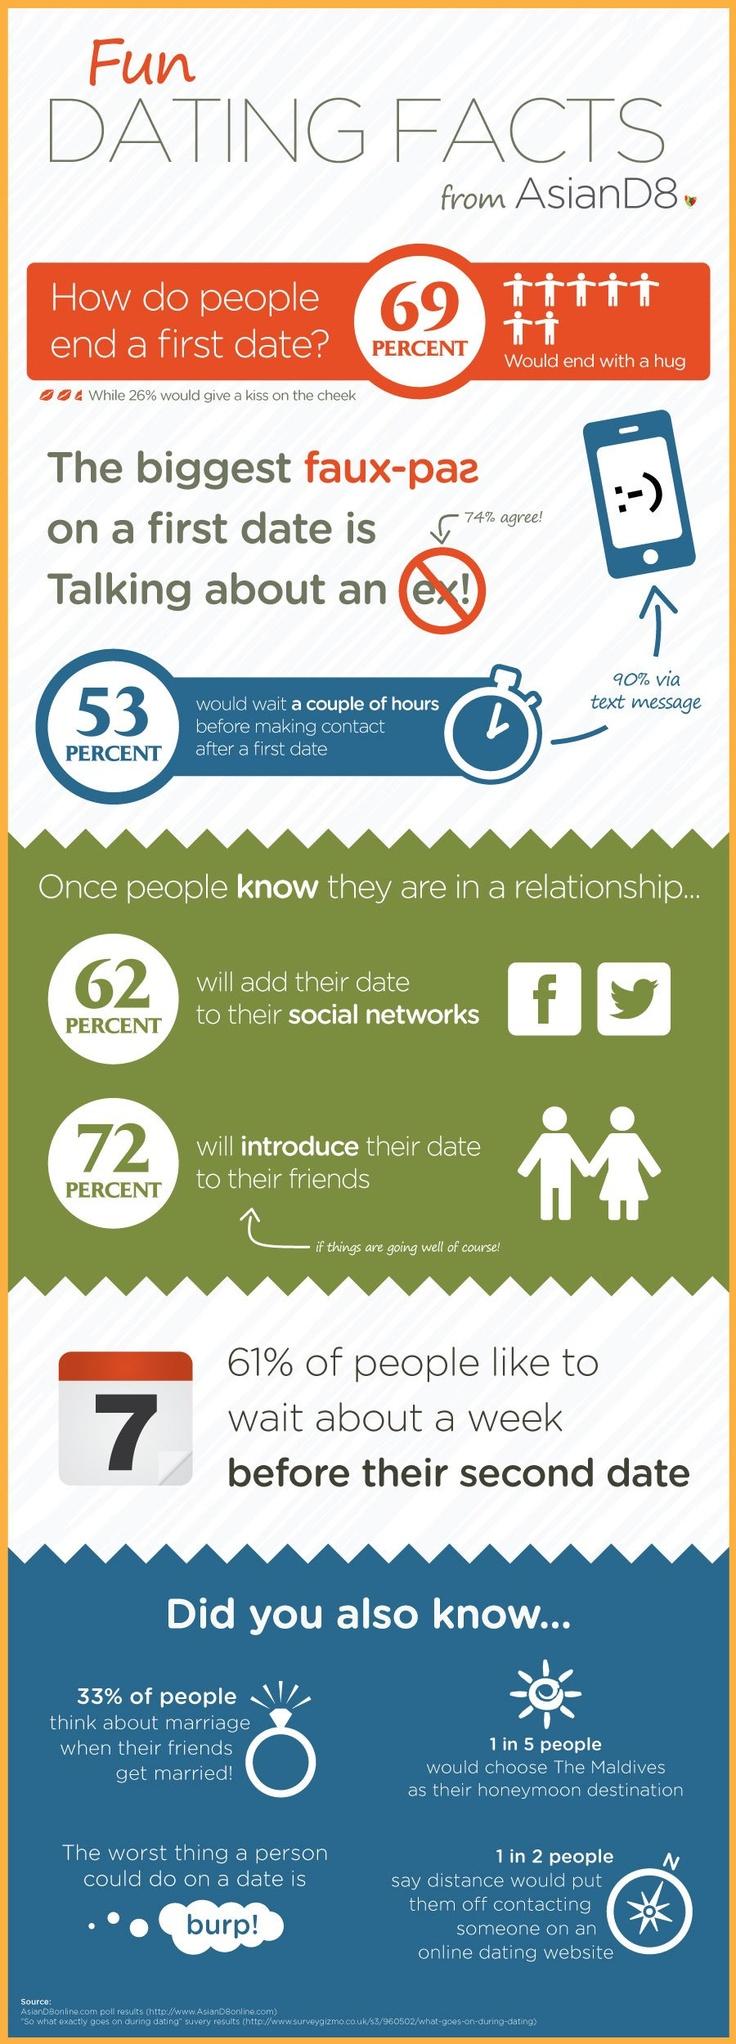 Online dating statistics for senior dating sites